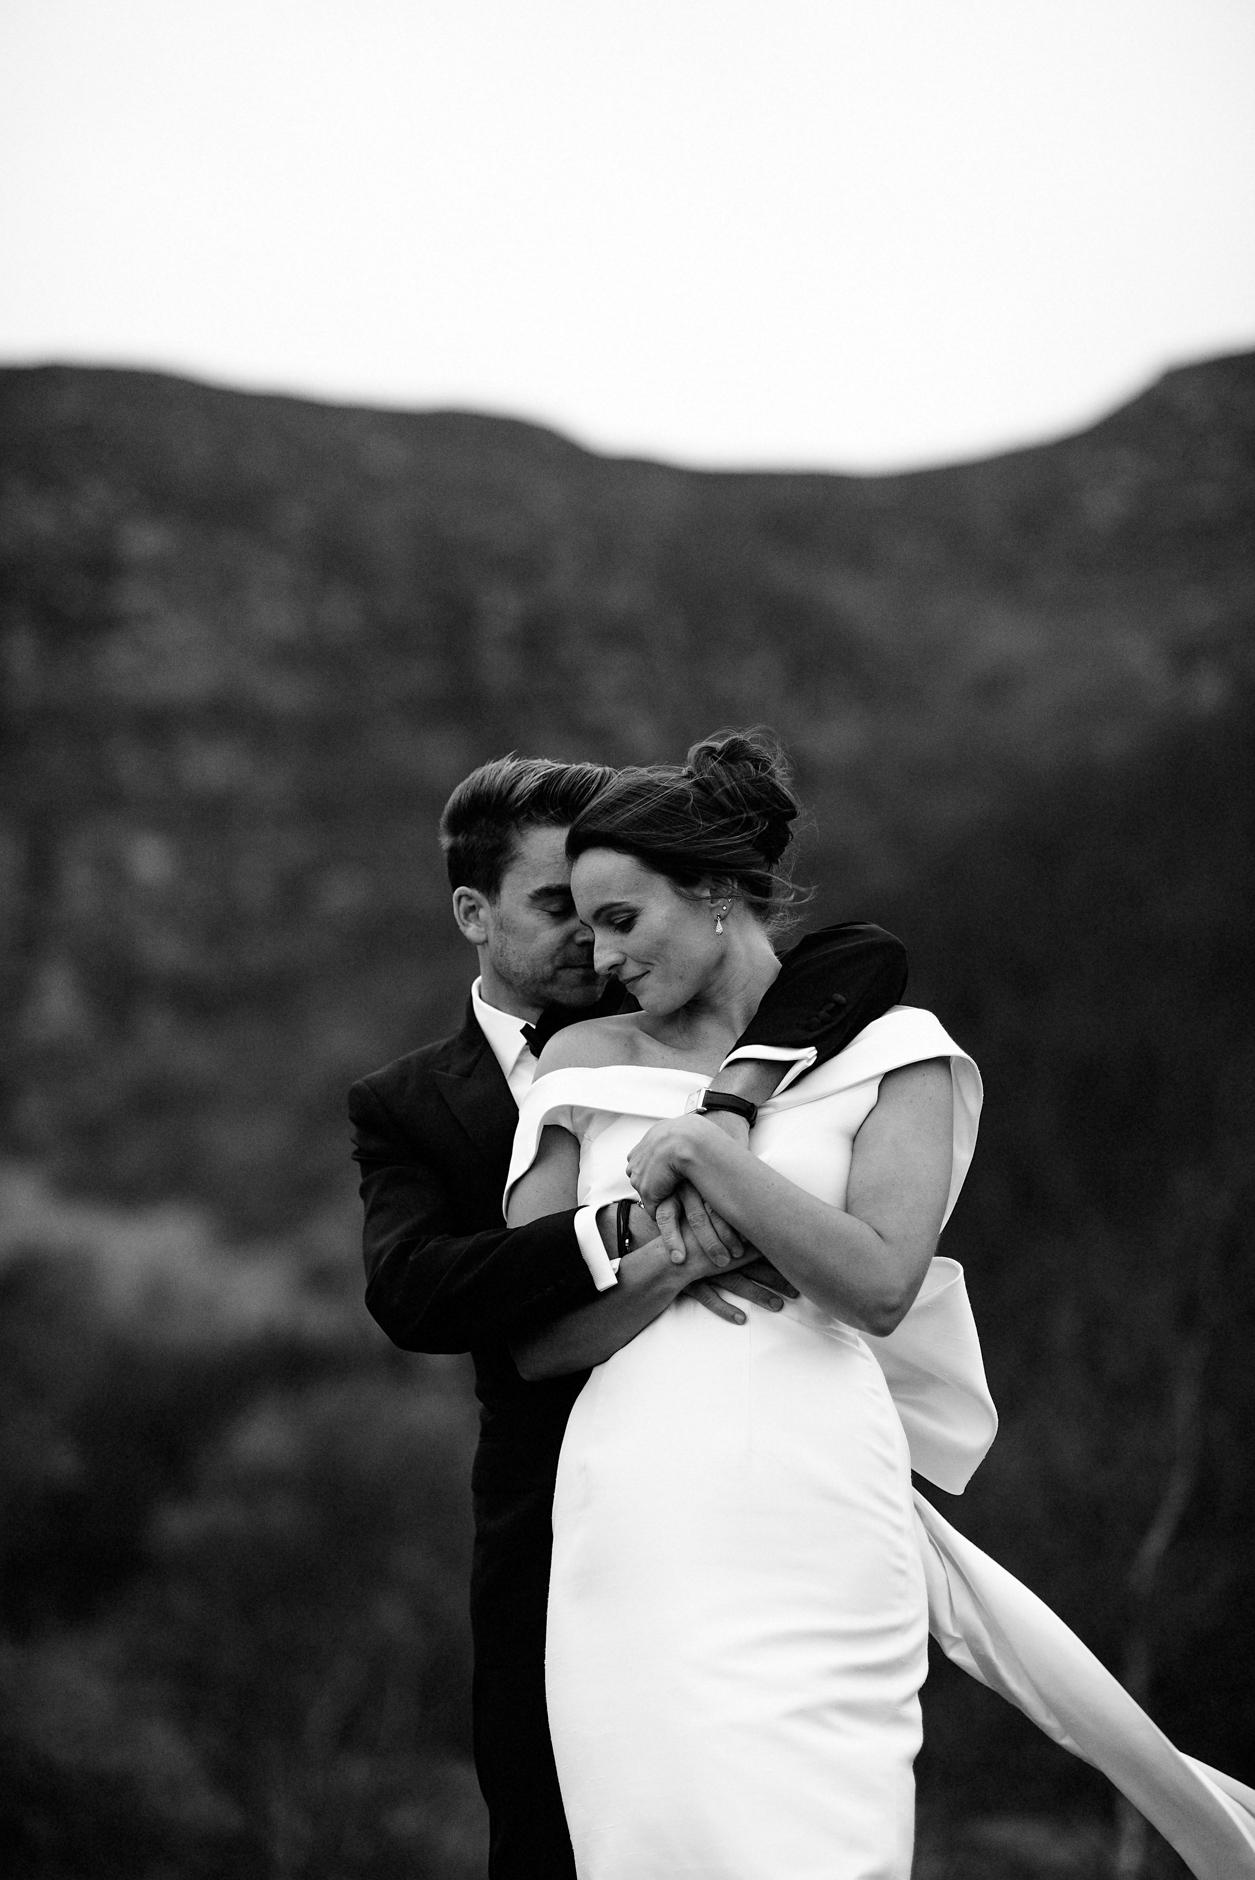 Glentruim-Wedding-Nikki-Leadbetter-Photography-156.jpg